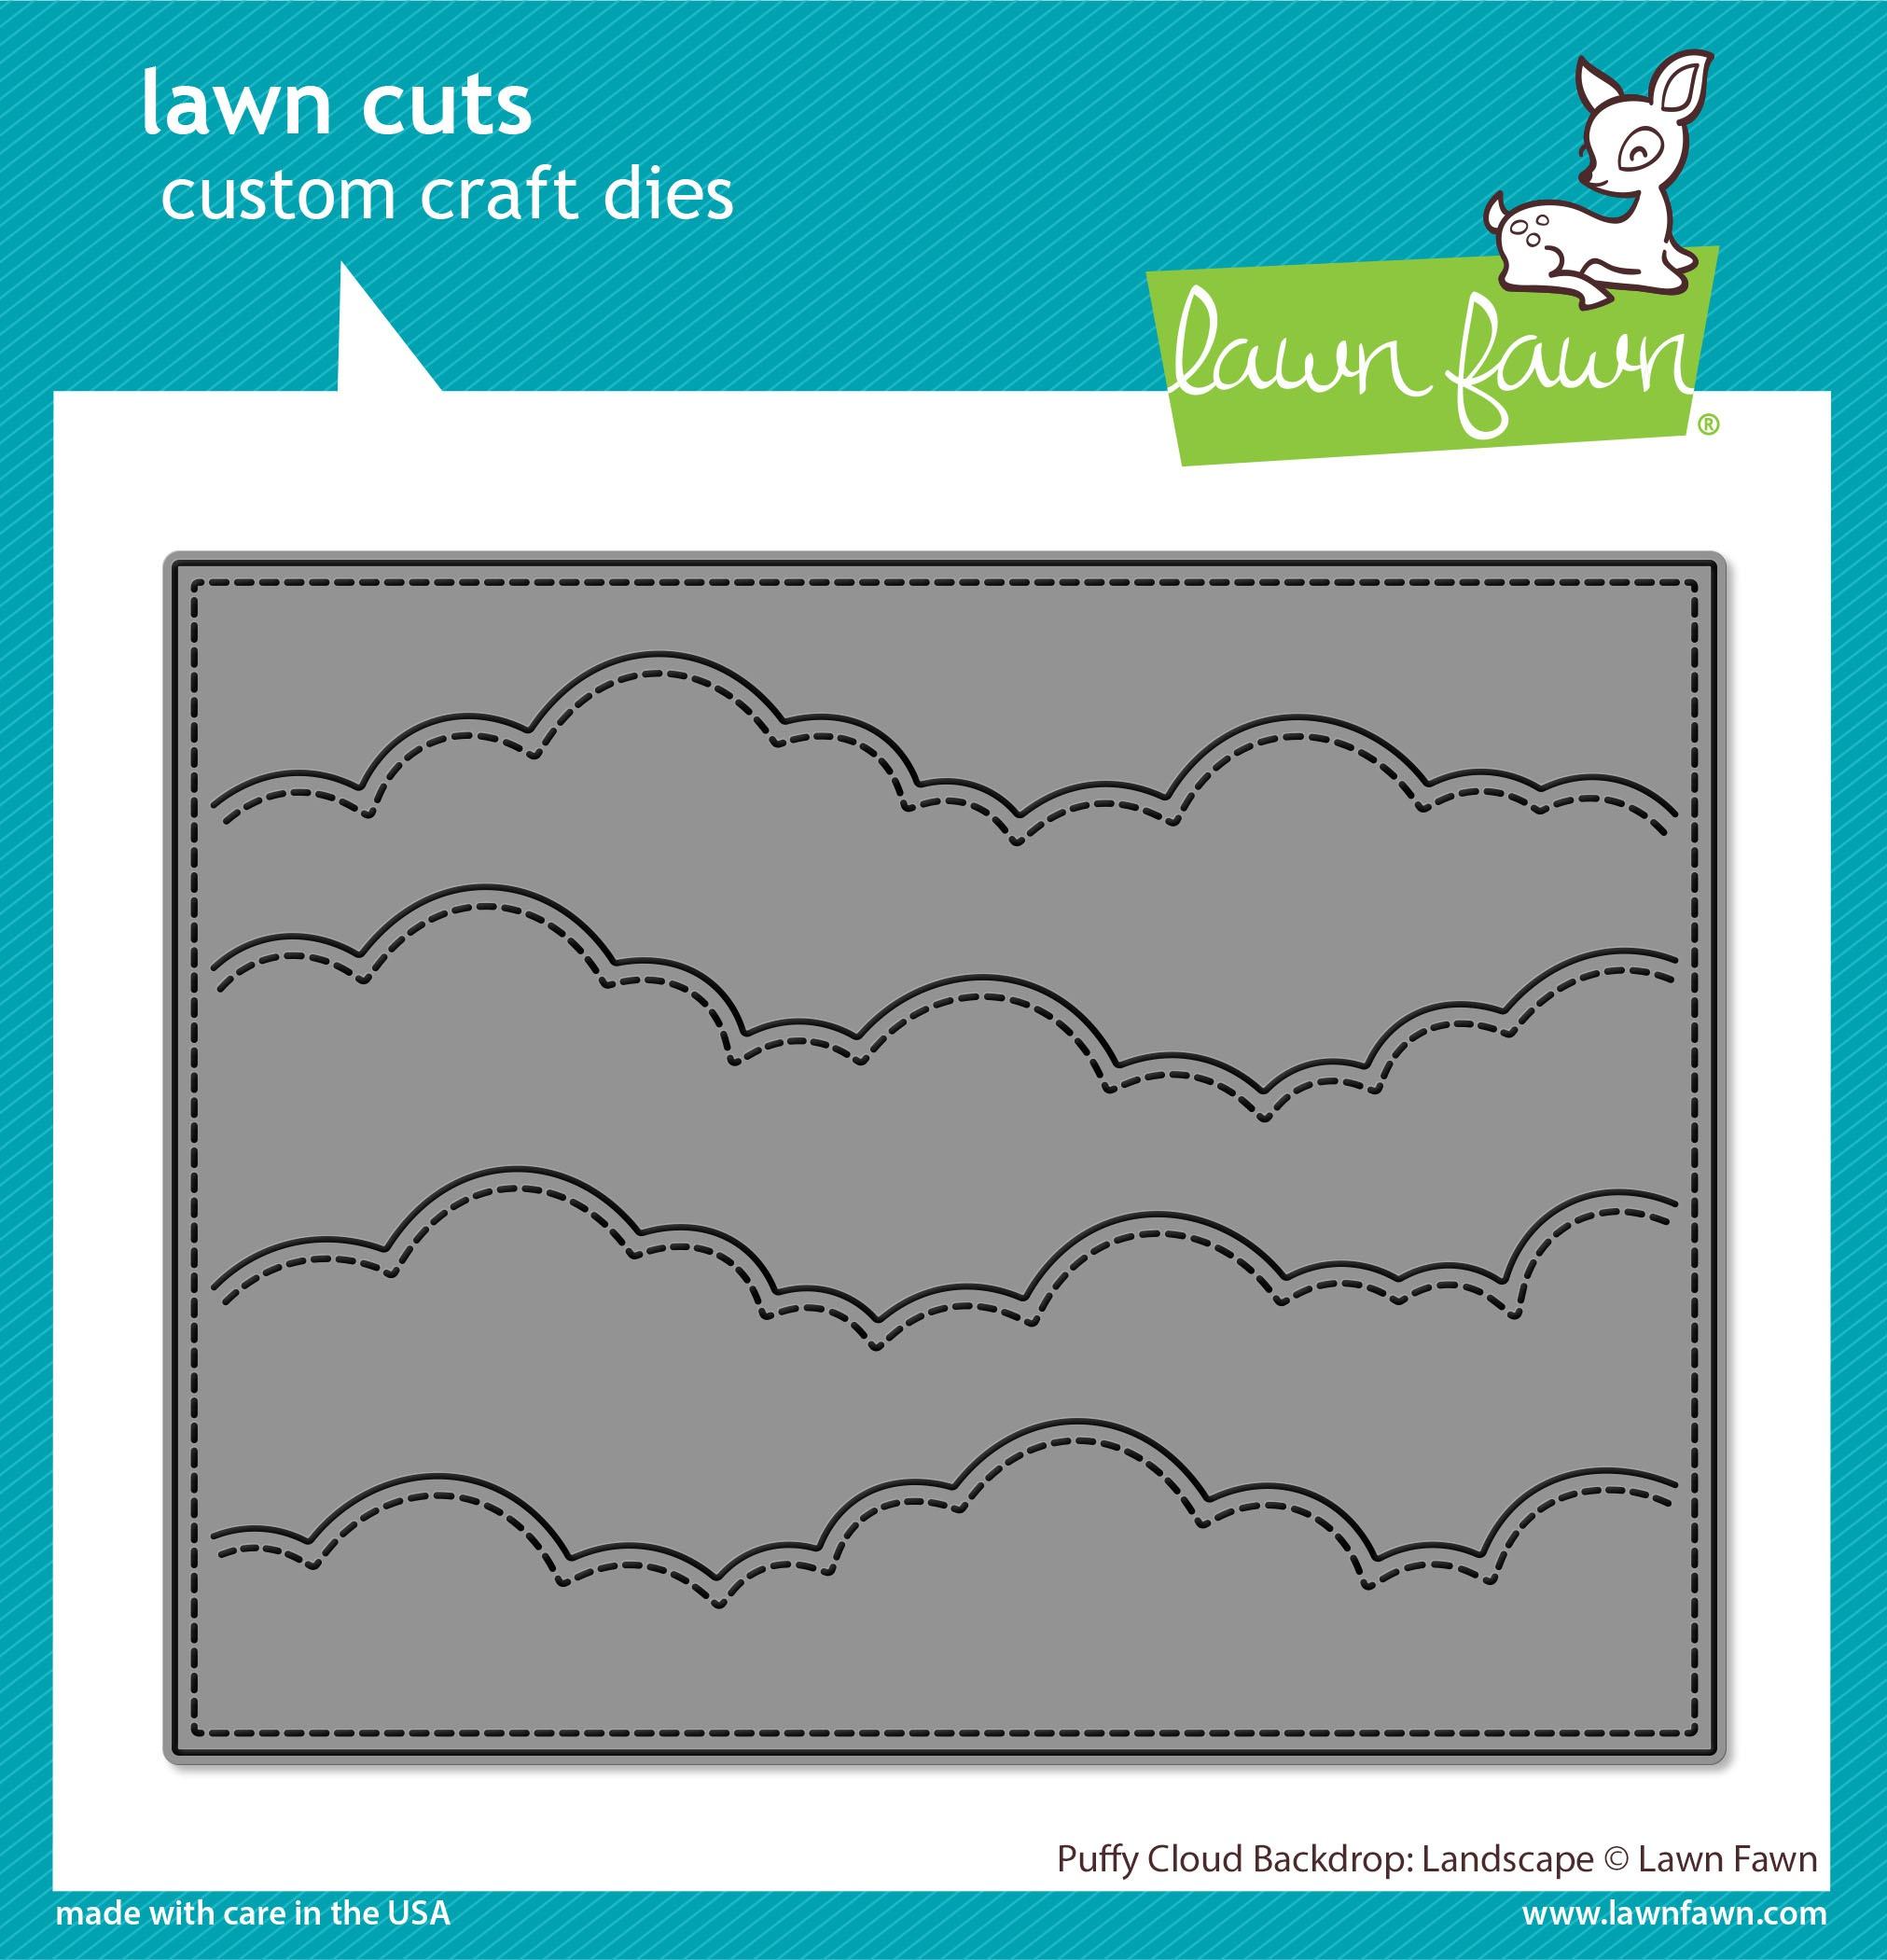 Lawn Cuts Custom Craft Die -Puffy Cloud Backdrop: Landscape